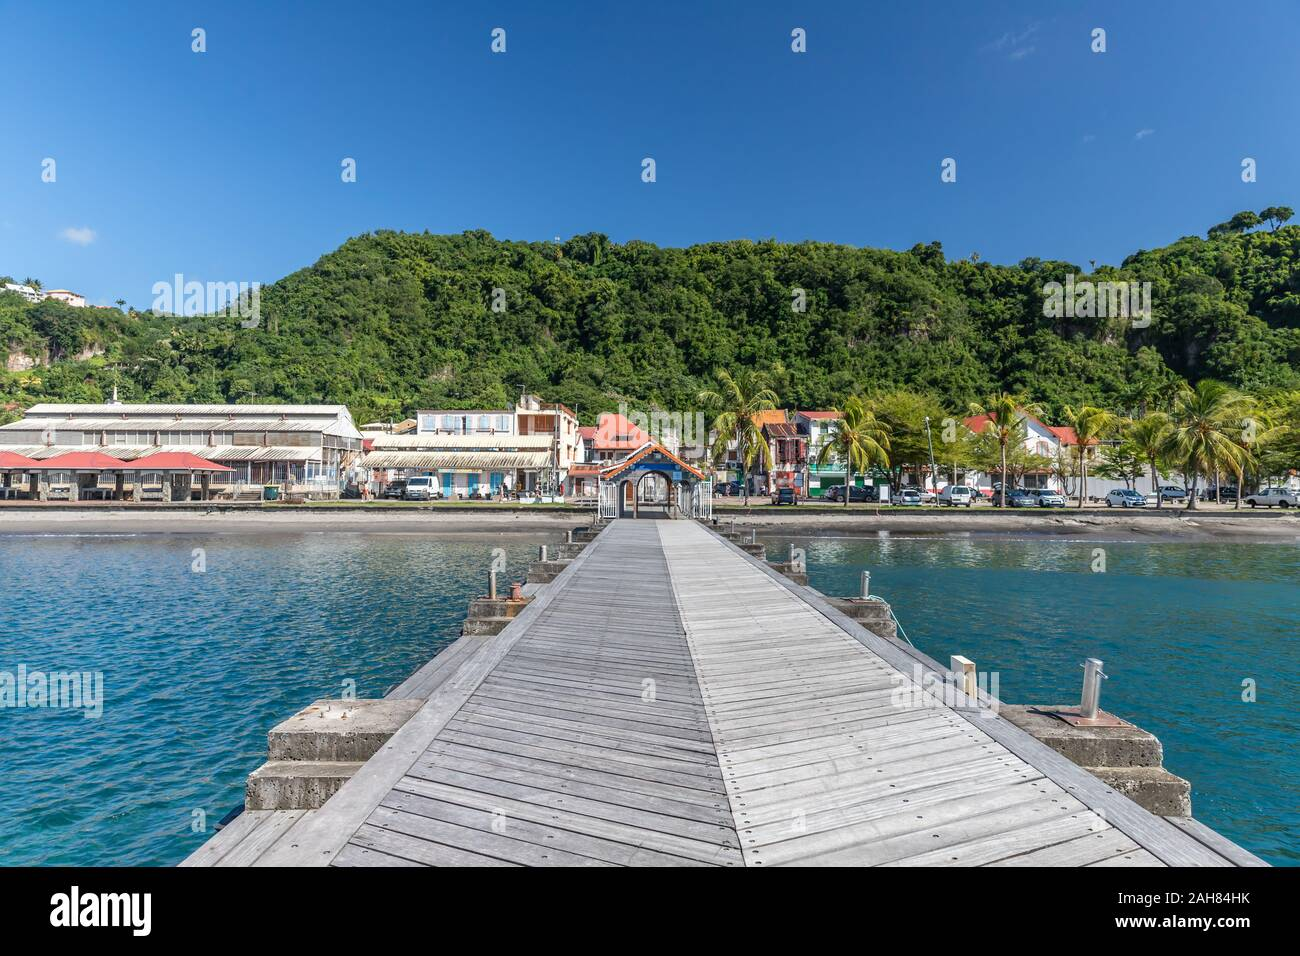 Pier with teak deck in Saint-Pierre, Martinique, France Stock Photo